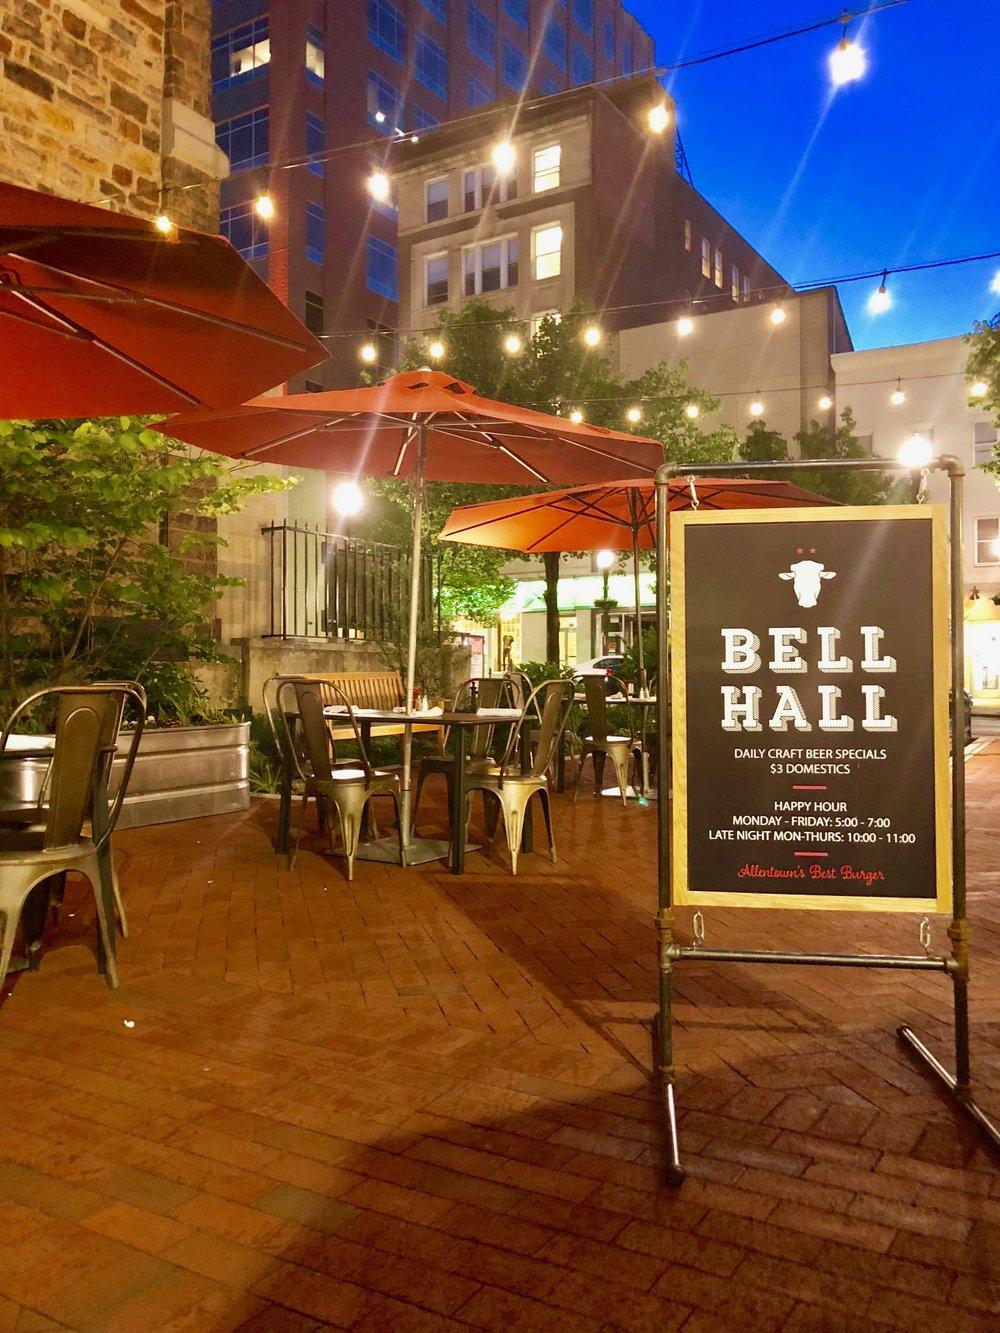 Restaurant Tower in Tula: interior, menu, own brewery